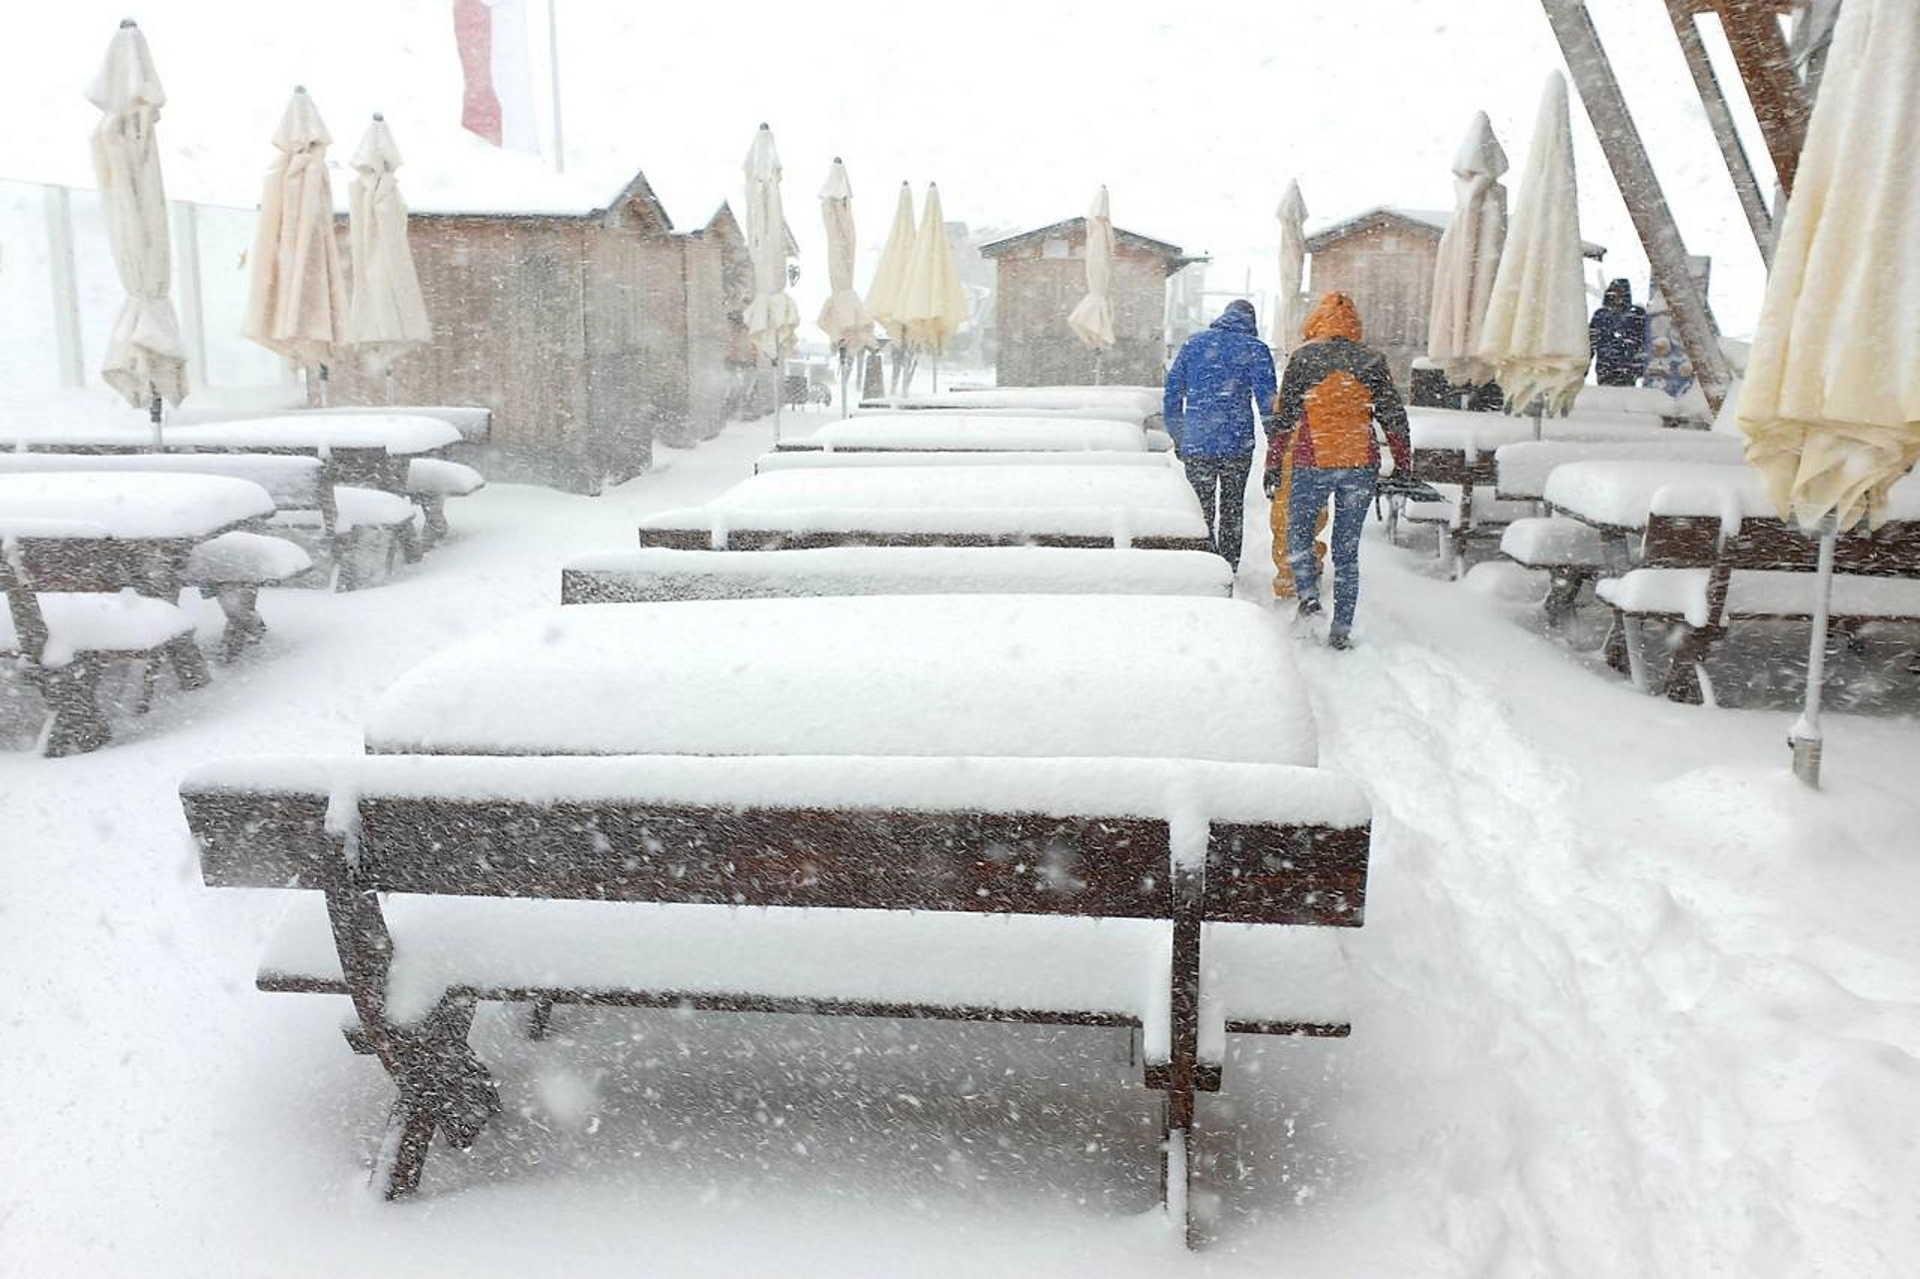 Tirolban eseik a hó